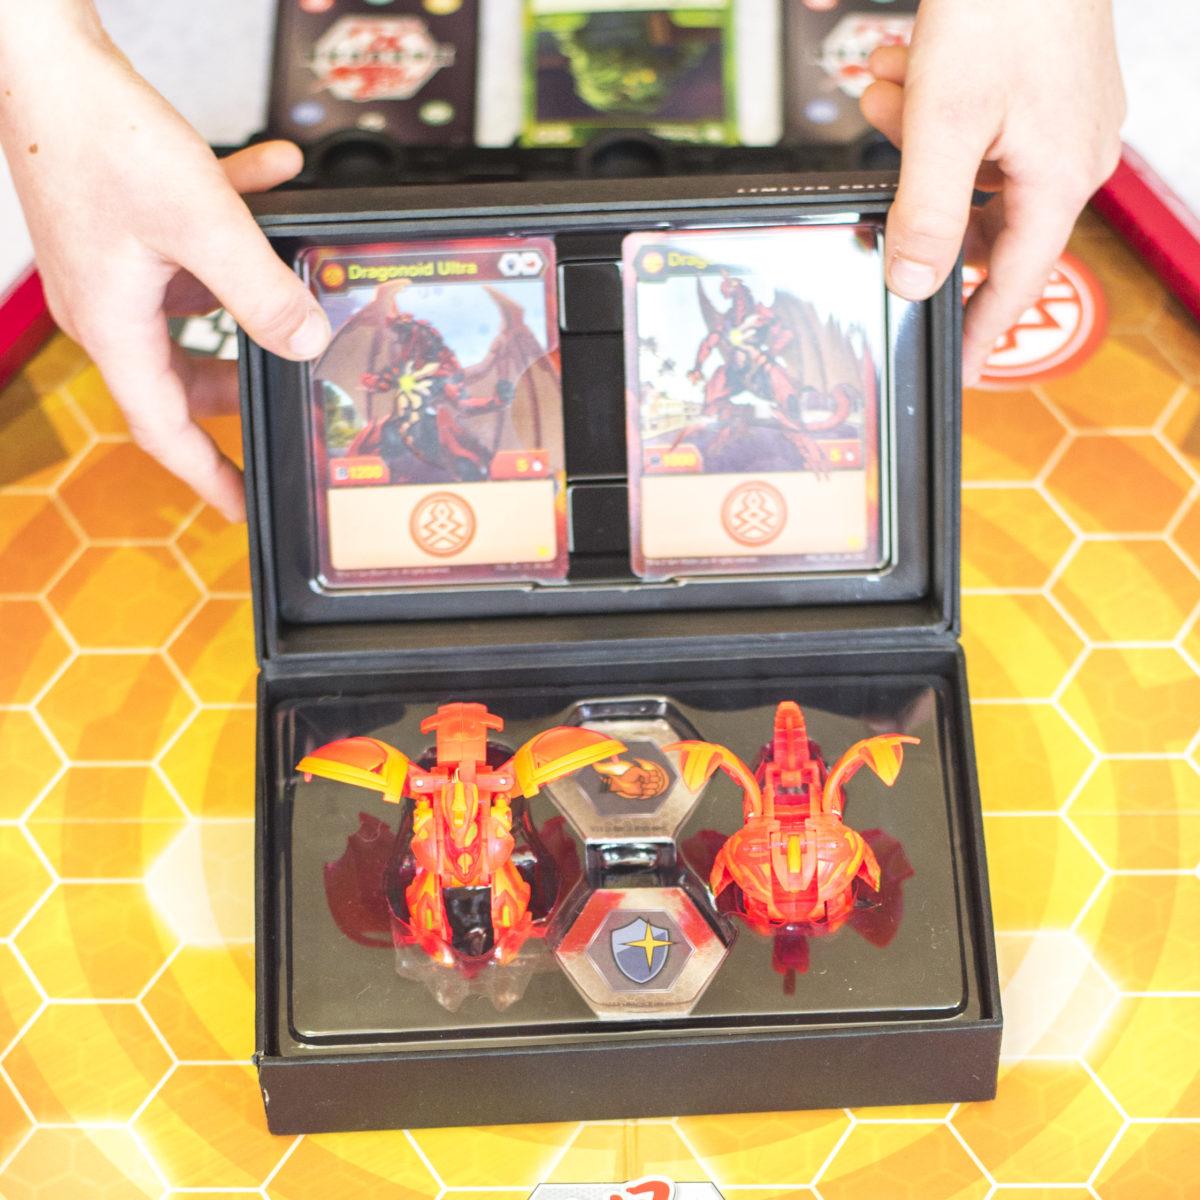 Limited Edition Dragonoid and Dragonoid Ultra Bakugan Bakuballs